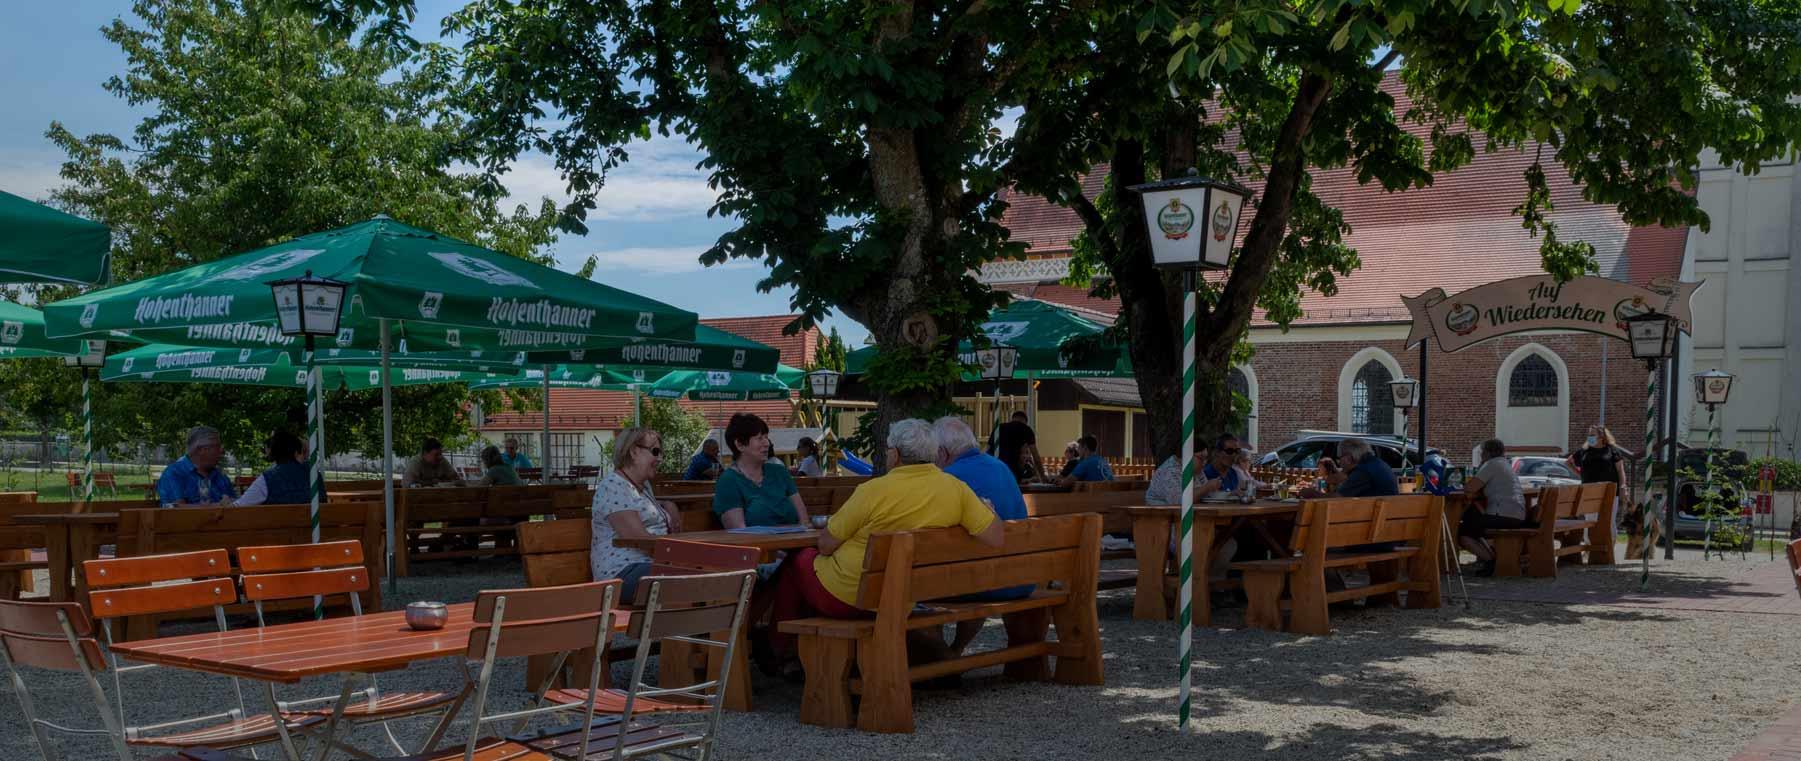 Biergarten Landshut